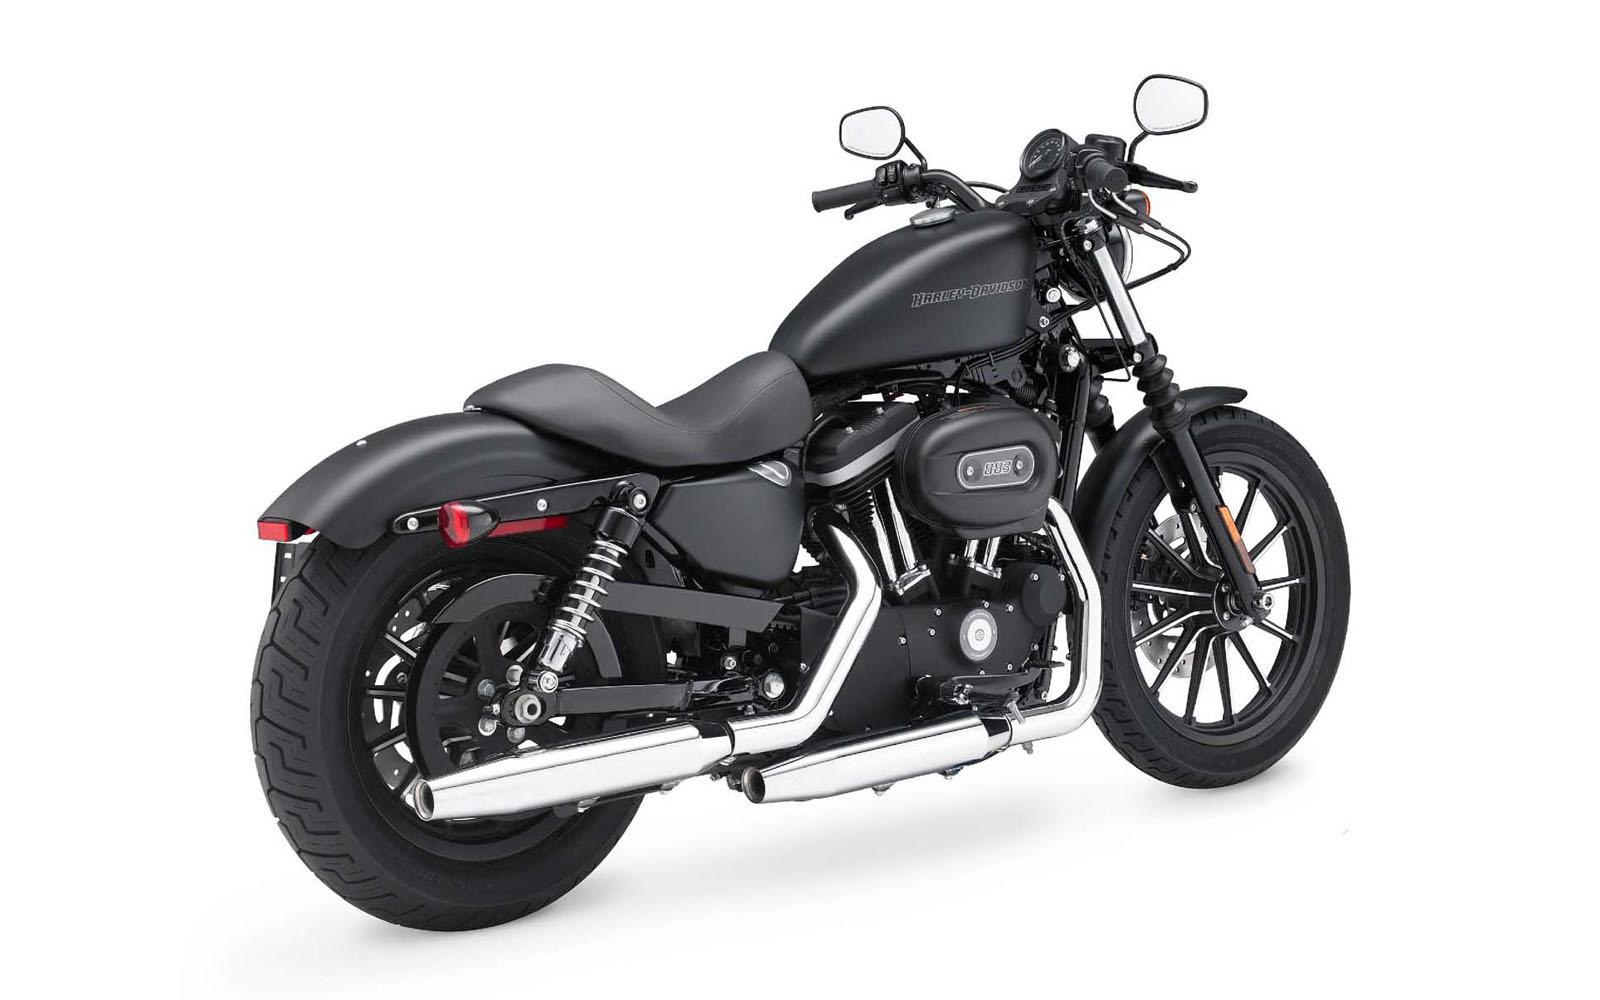 Desktop Wallpapers Harley Davidson Motorcycle Desktop Wallpapers 1600x1000